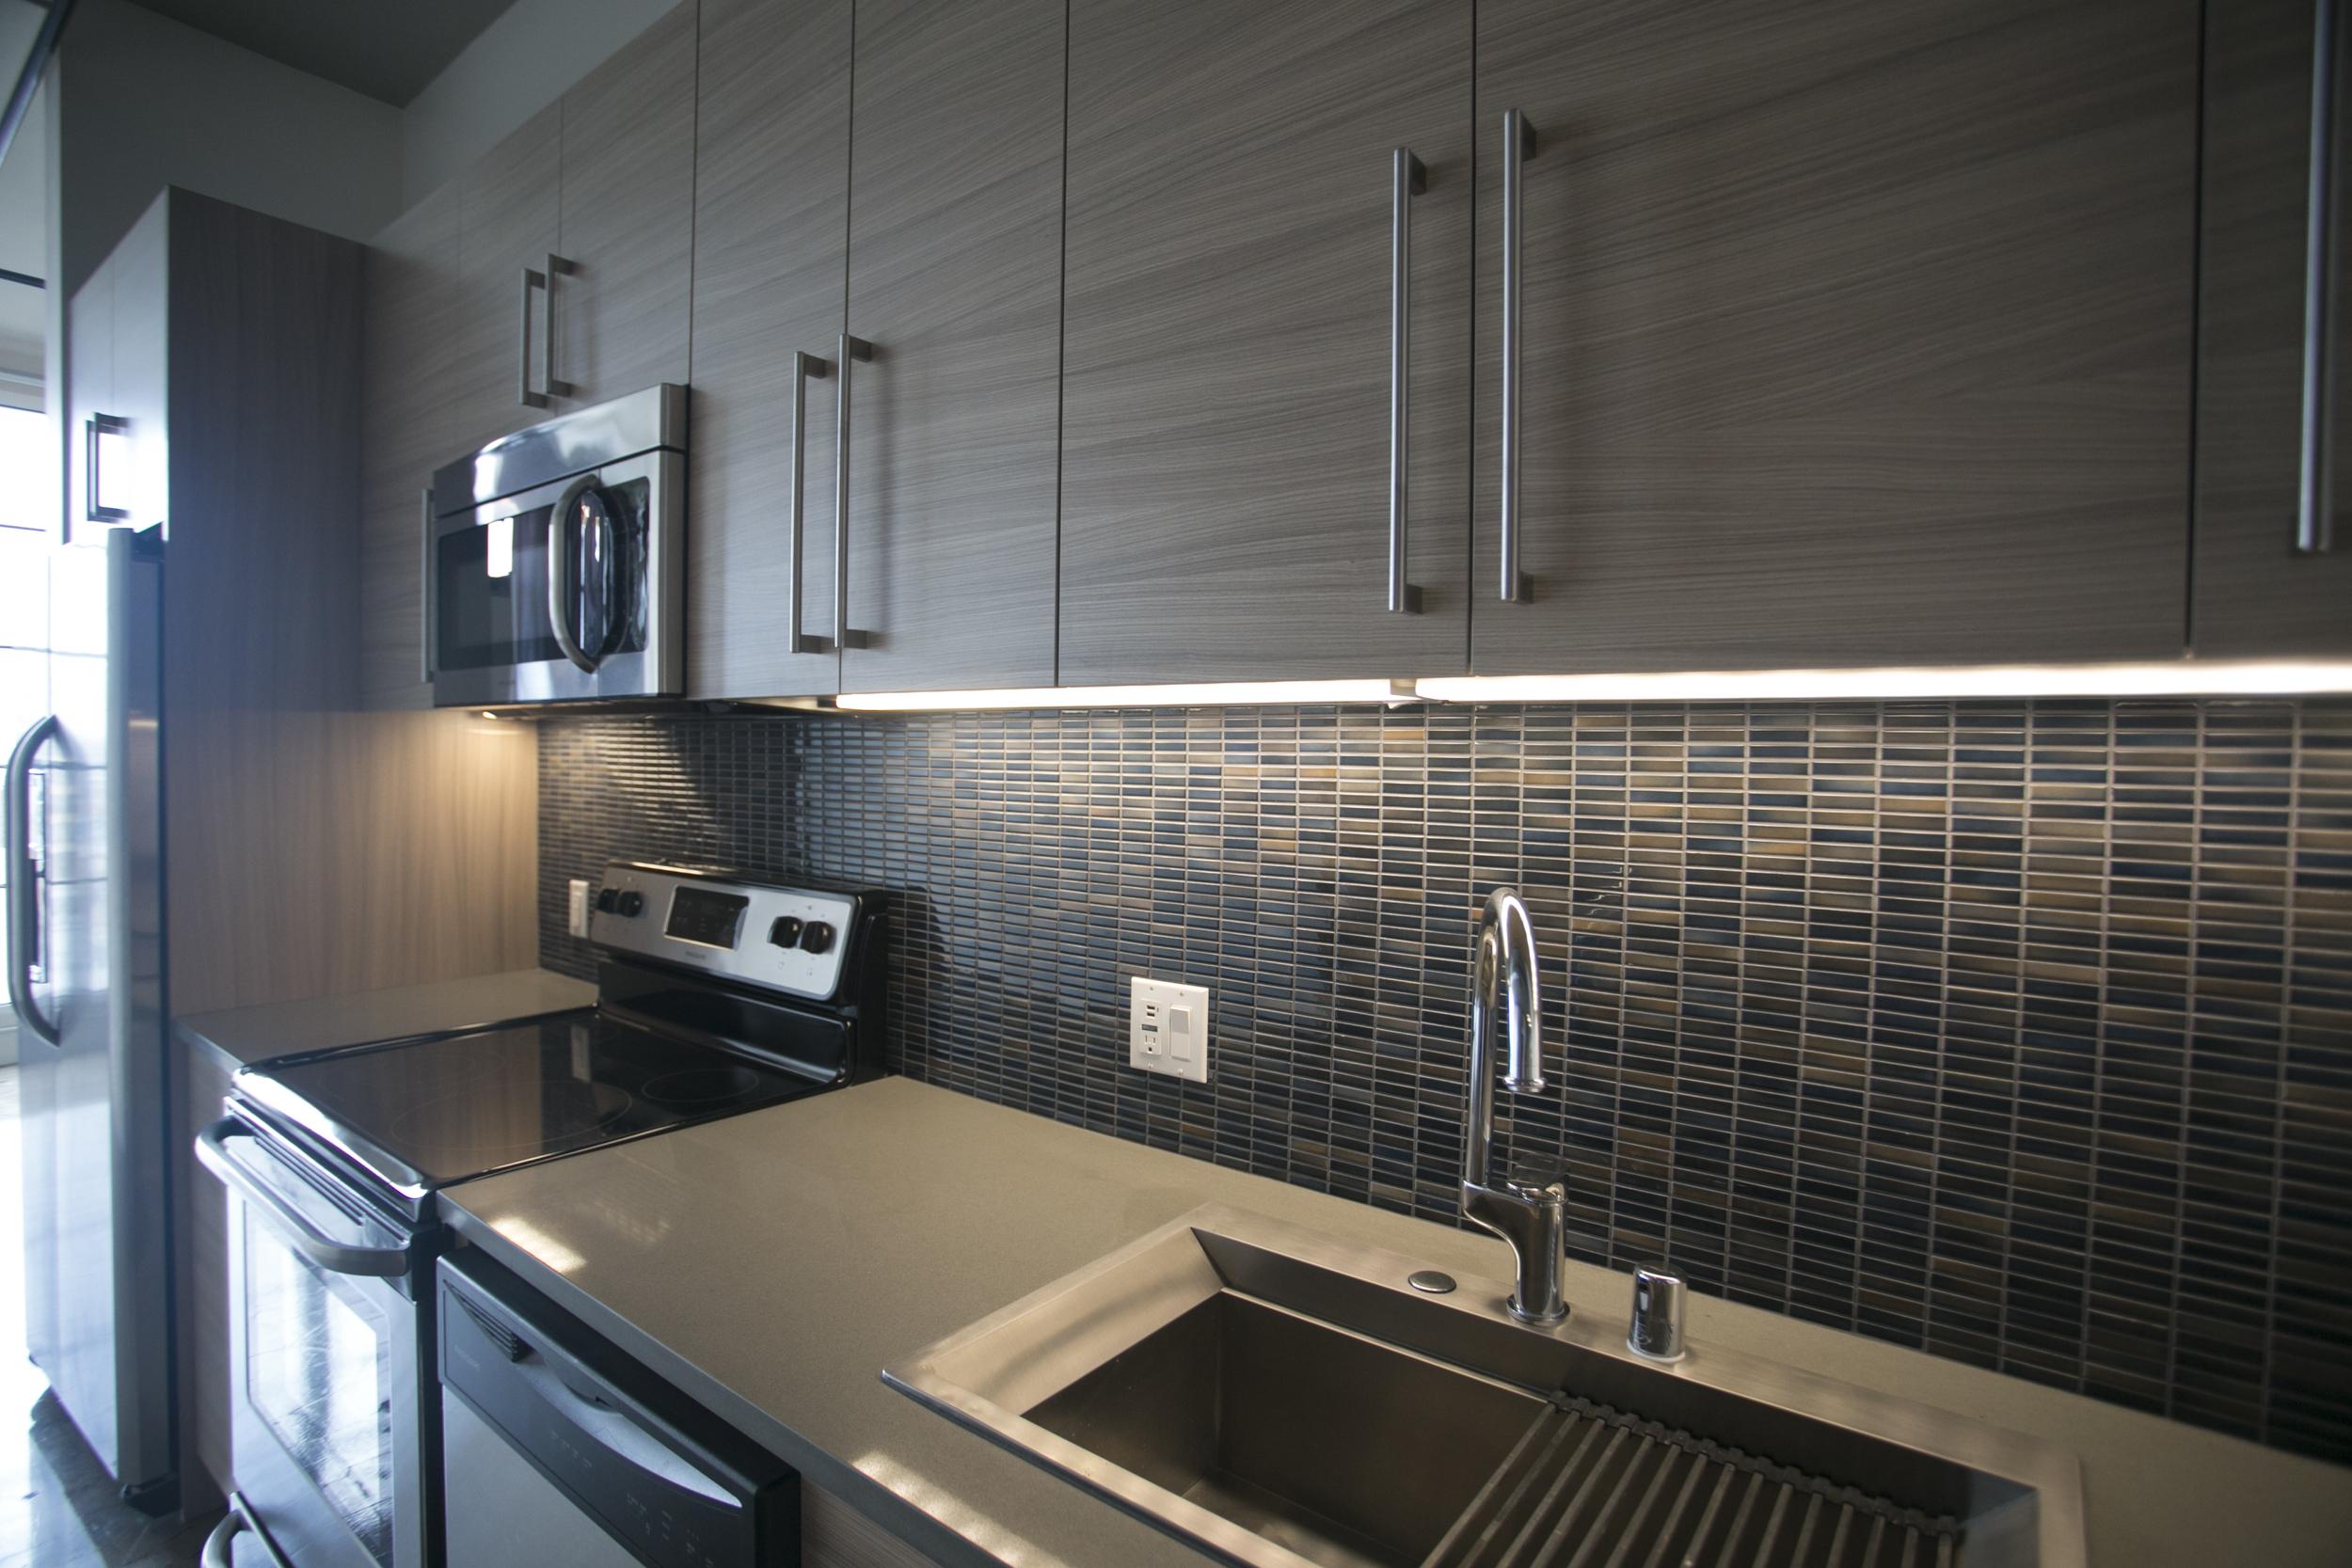 Kitchen Backsplash at Maxfield